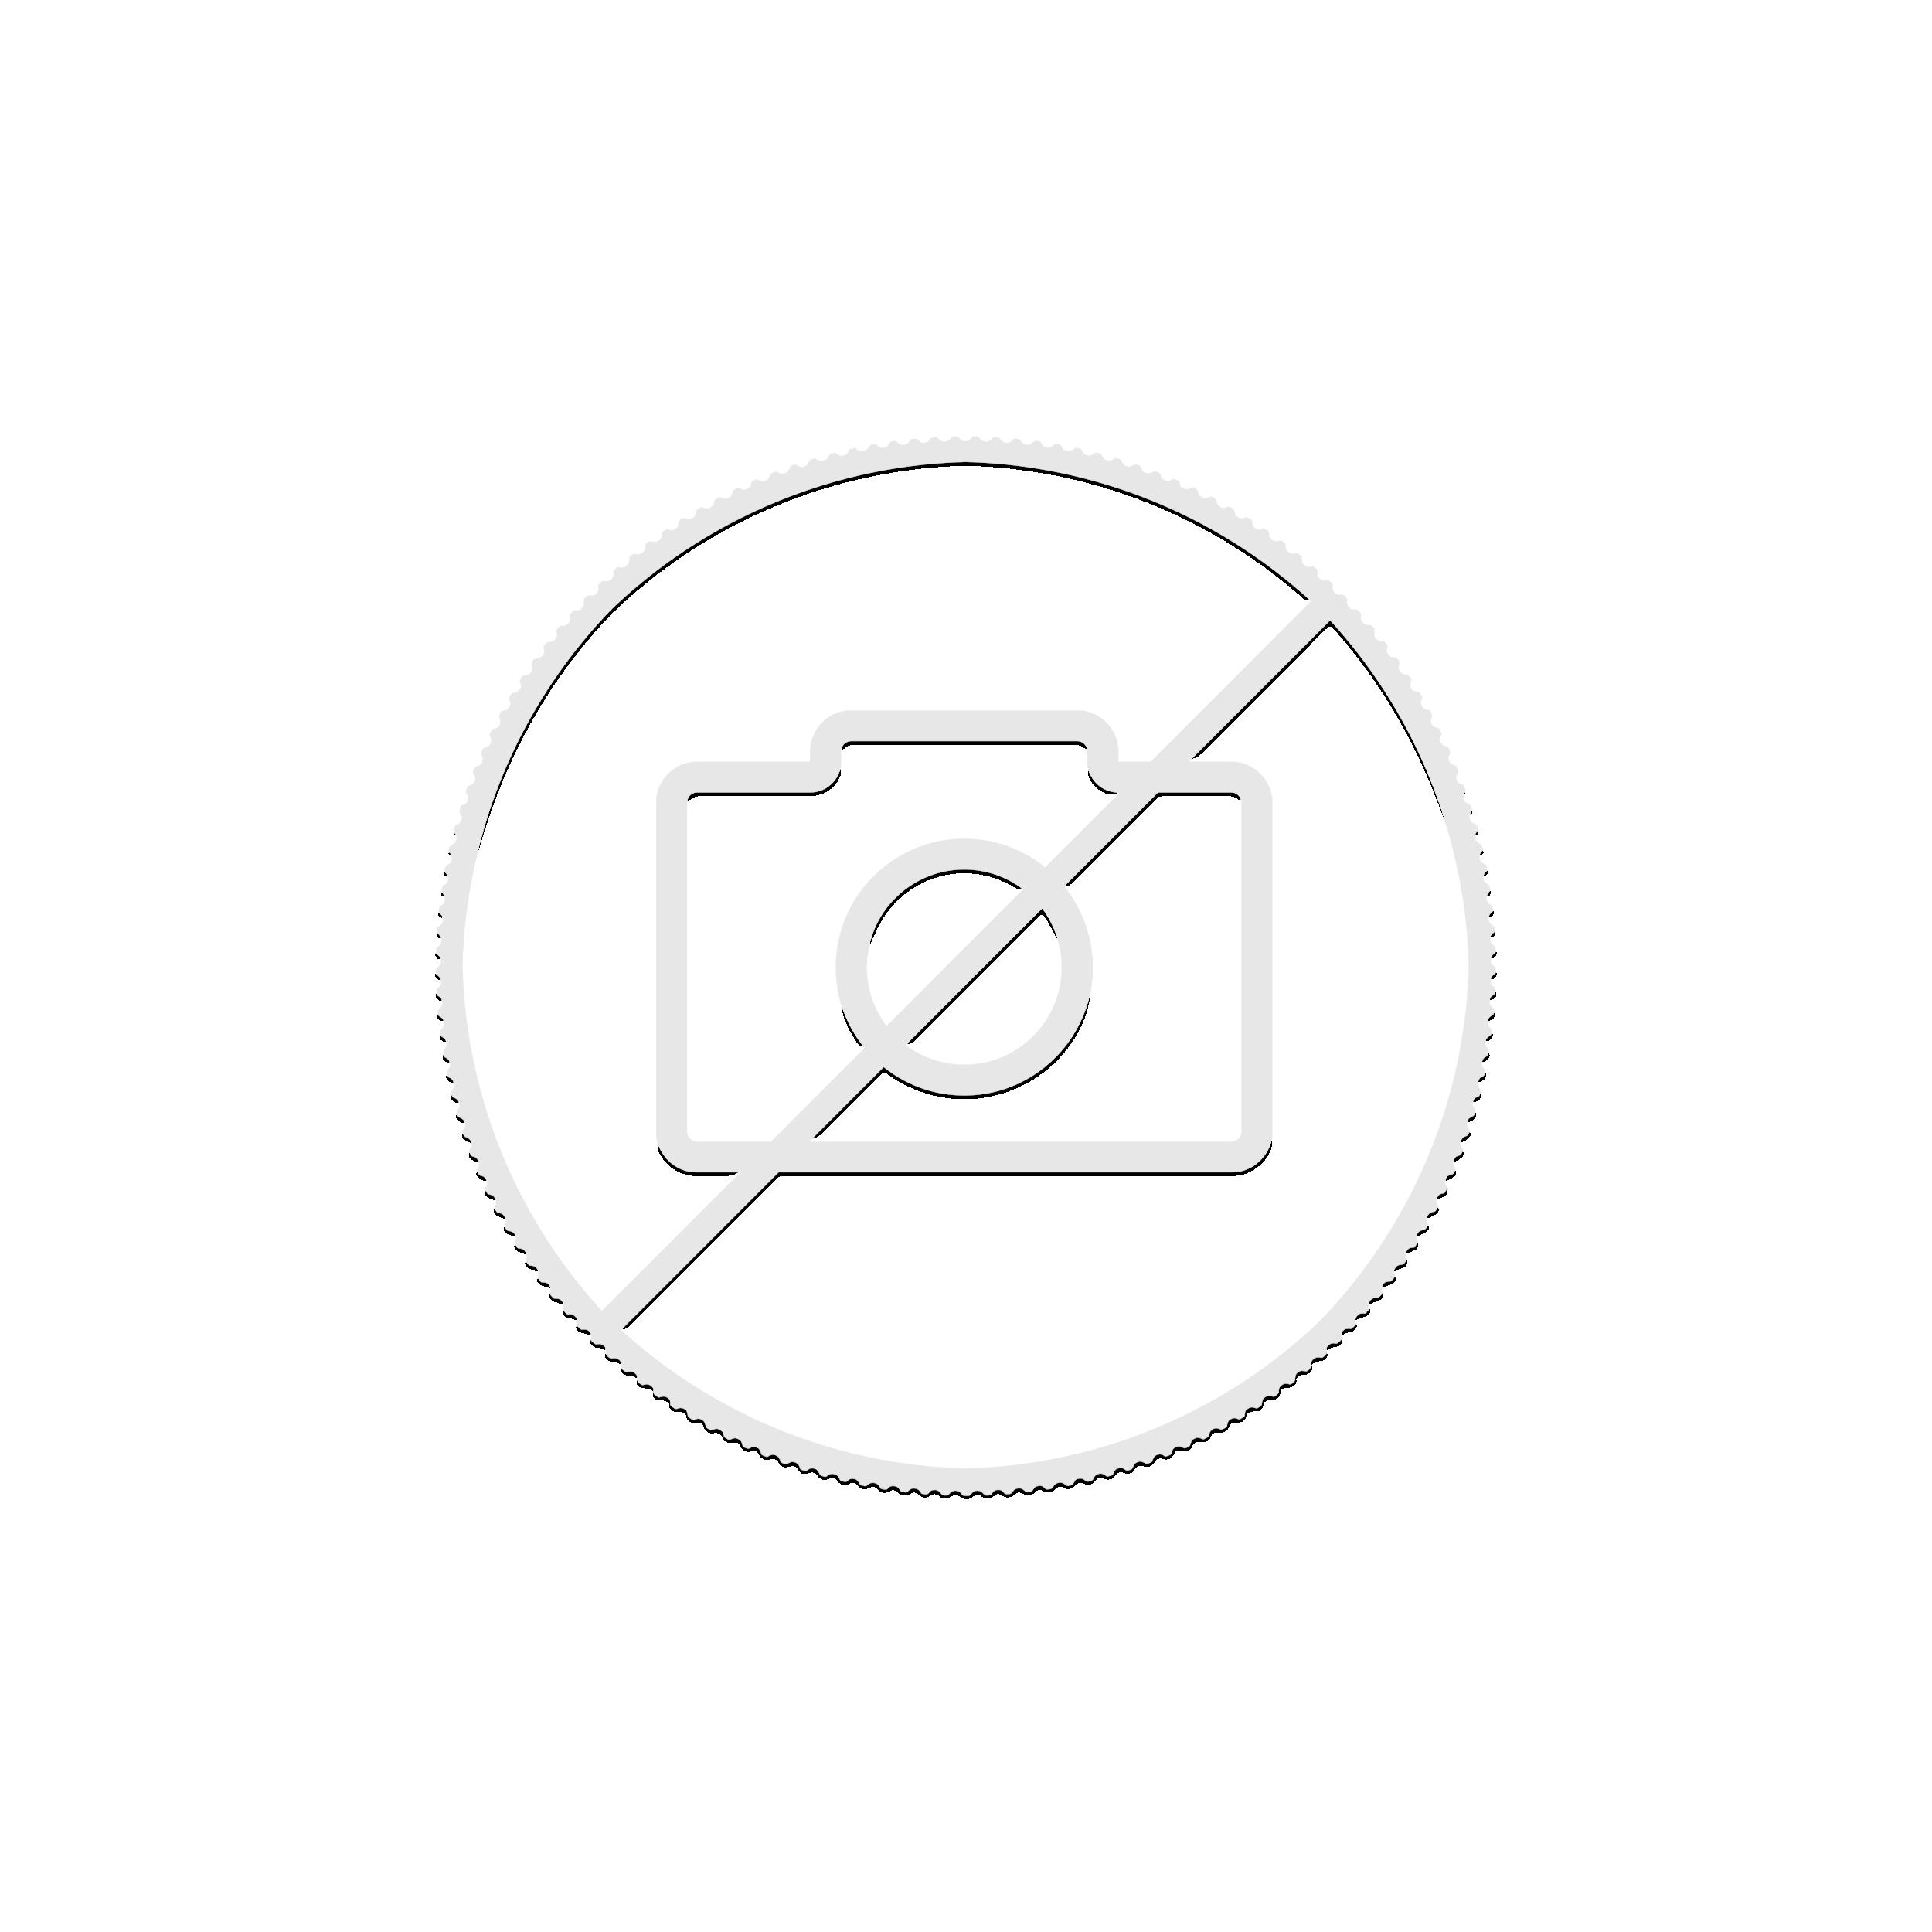 1/4 Troy ounce Golden Eagle coin